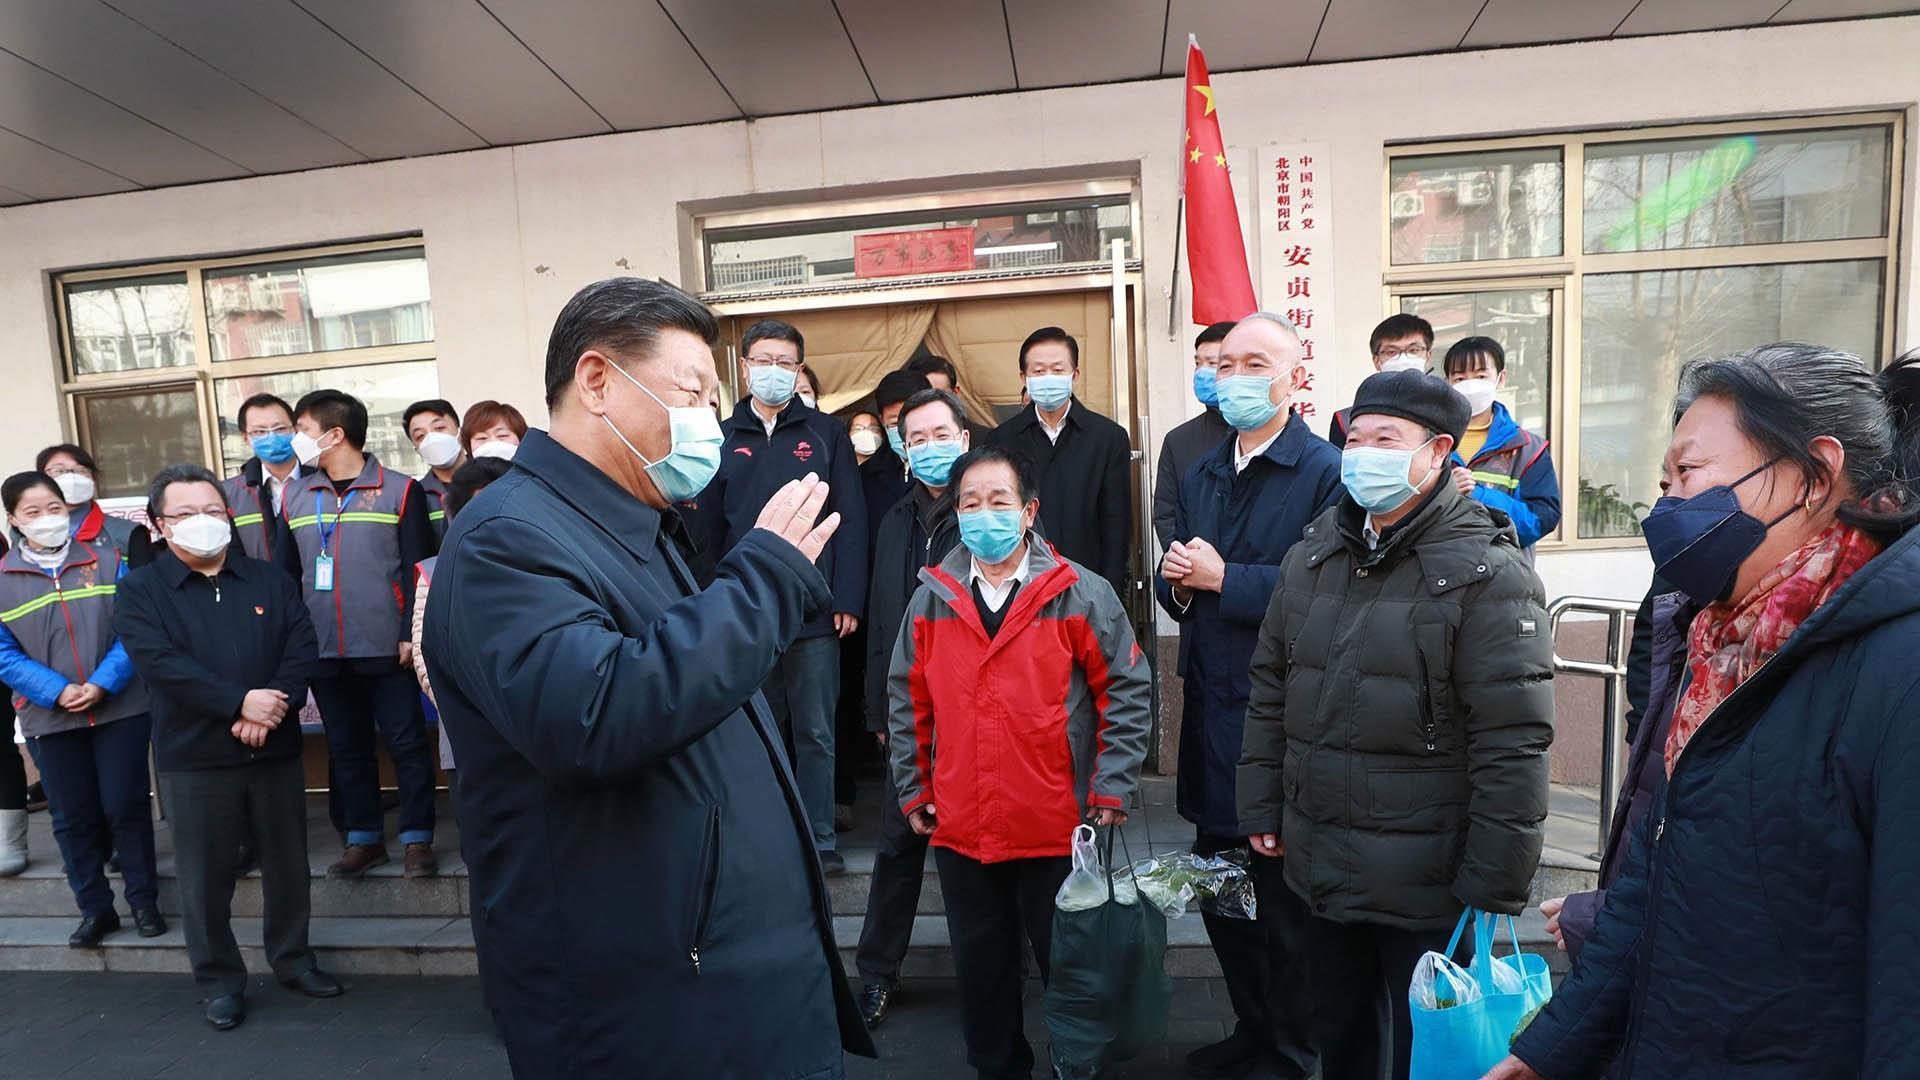 Coronavirus: China's Xi Jinping faces his biggest challenge